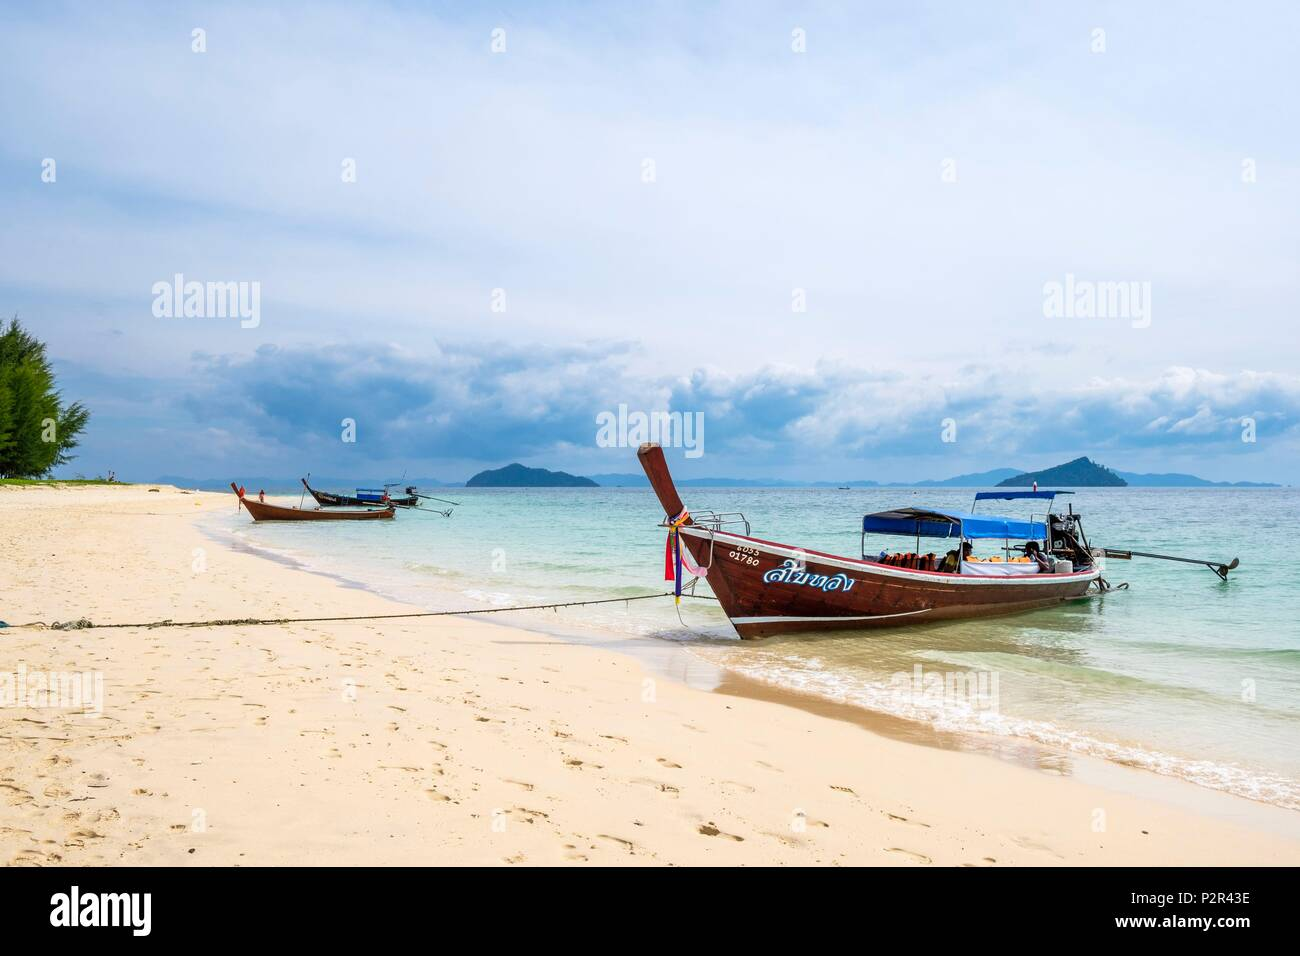 Thailand, Satun province, Mu Ko Phetra Marine National Park, Ko Bulon Leh island, the large white sand beach to the east of the island - Stock Image